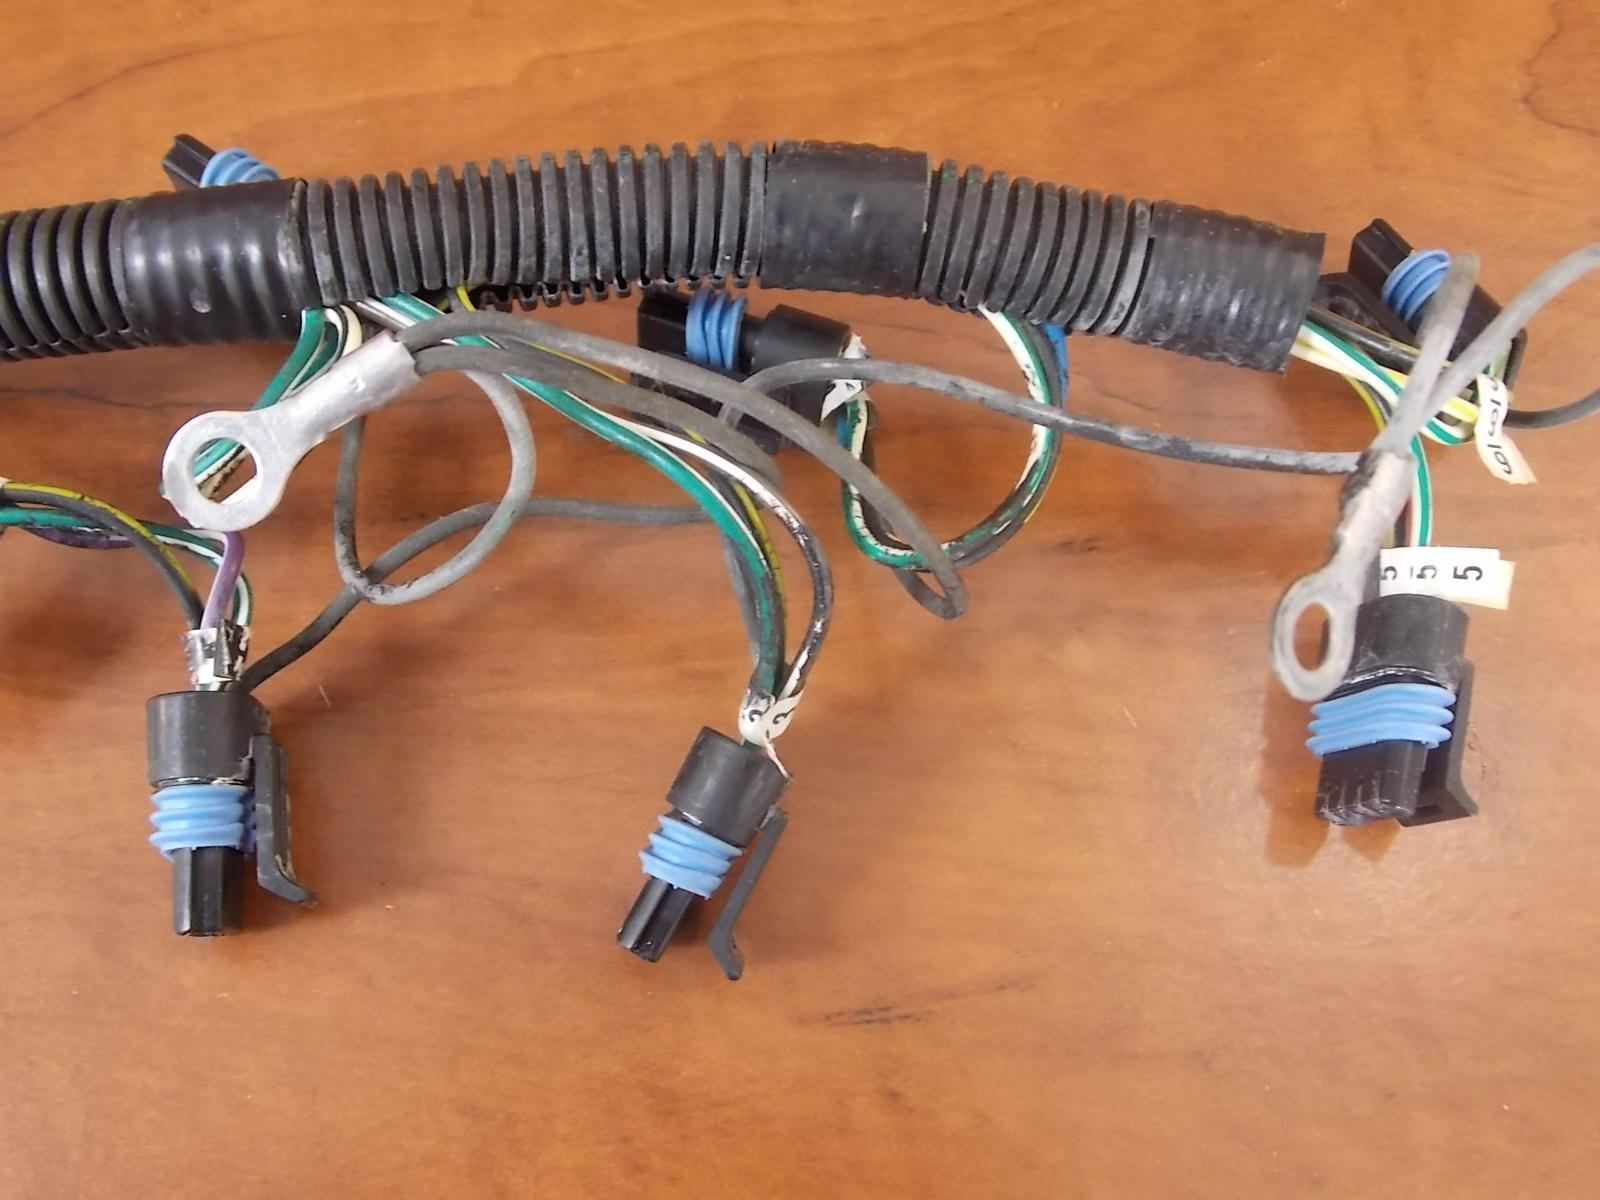 857163t1 mercury mariner cdm wiring harness 2000 2005. Black Bedroom Furniture Sets. Home Design Ideas